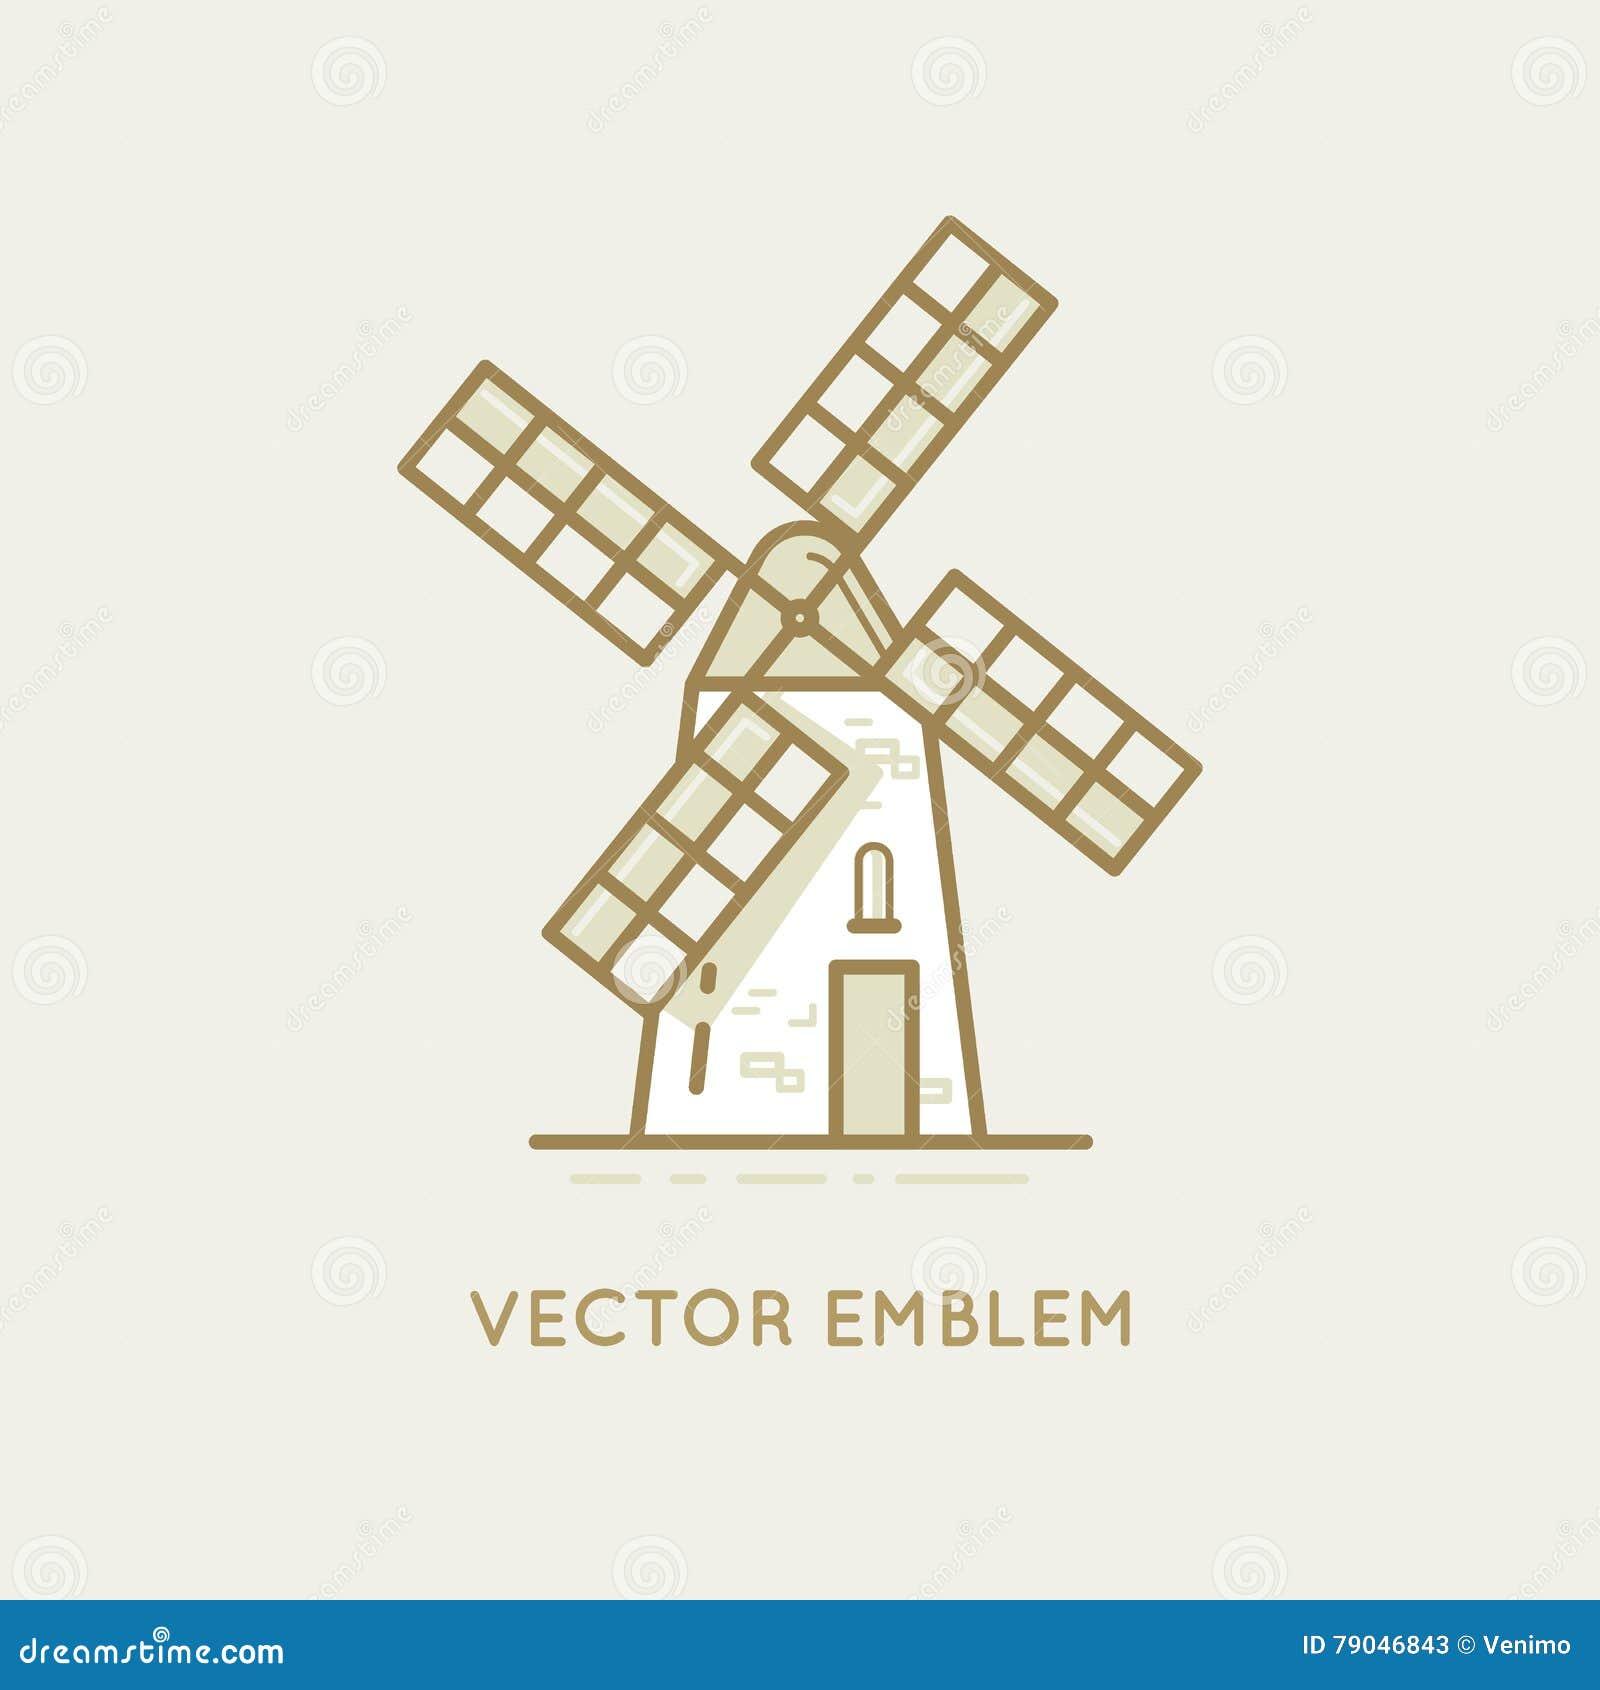 windmill bakery emblem stock vector illustration of label 79046843